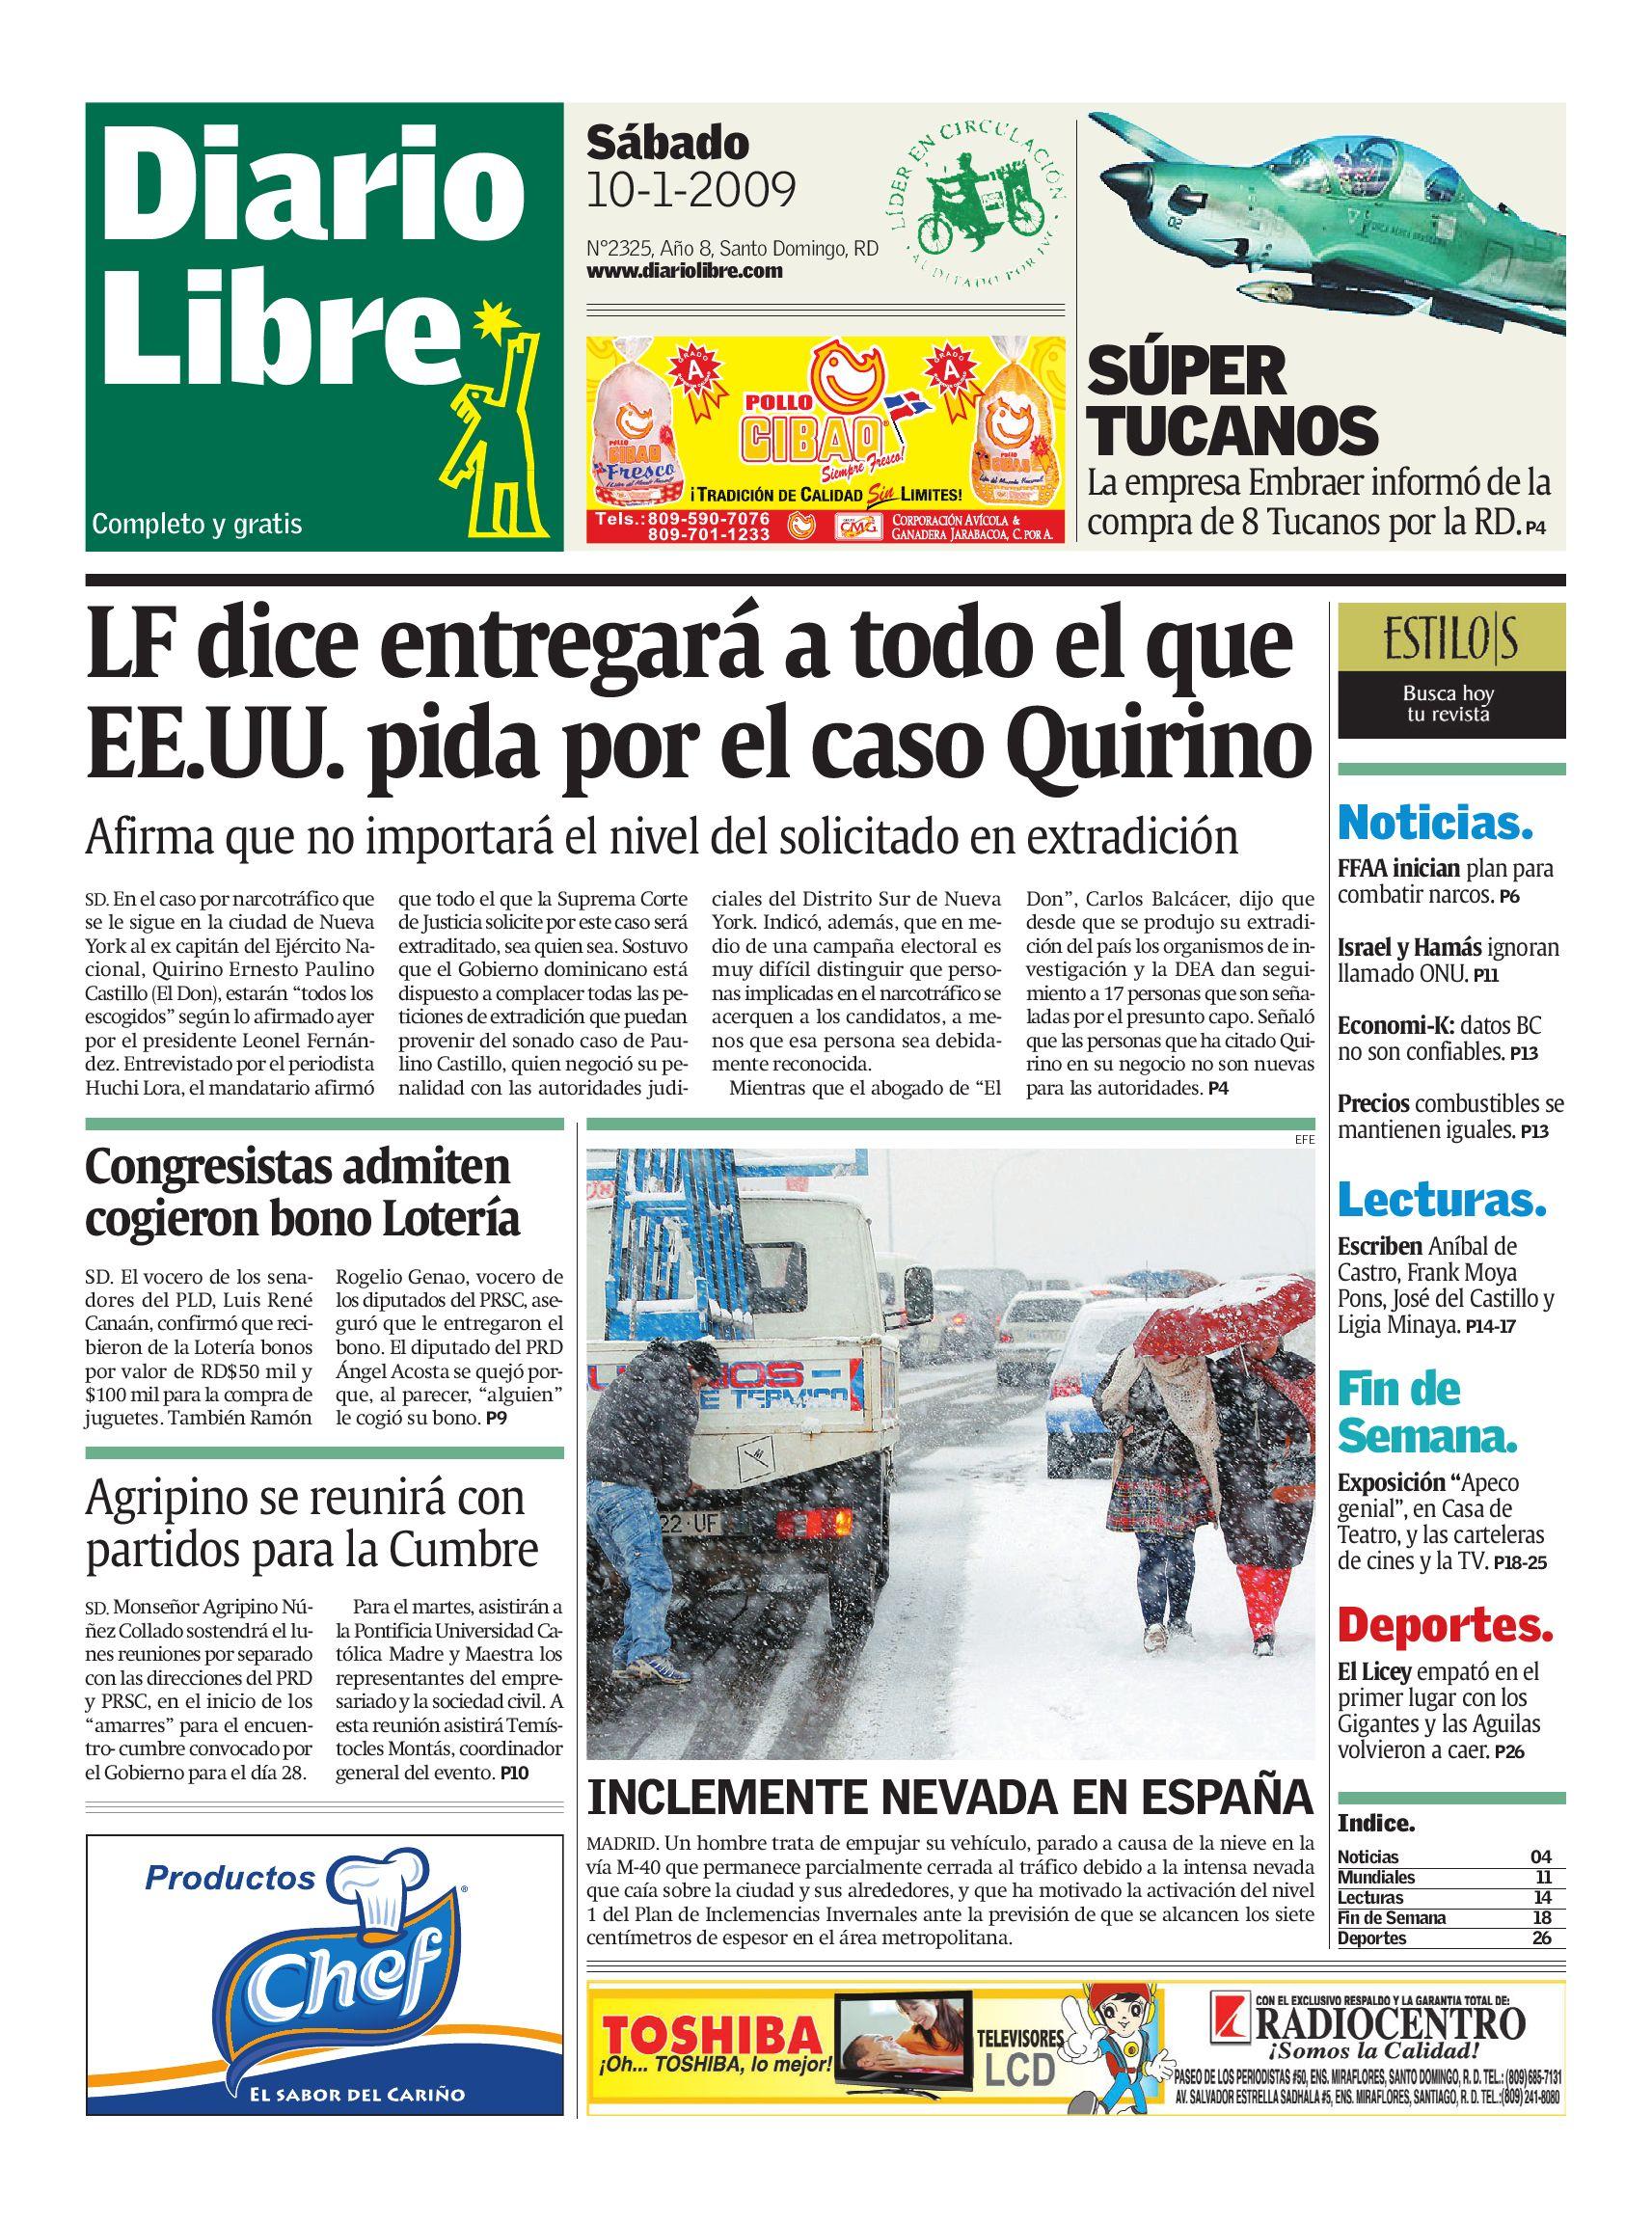 Maquinas tragamonedas de 50 lineas comprar loteria en Tijuana-177066